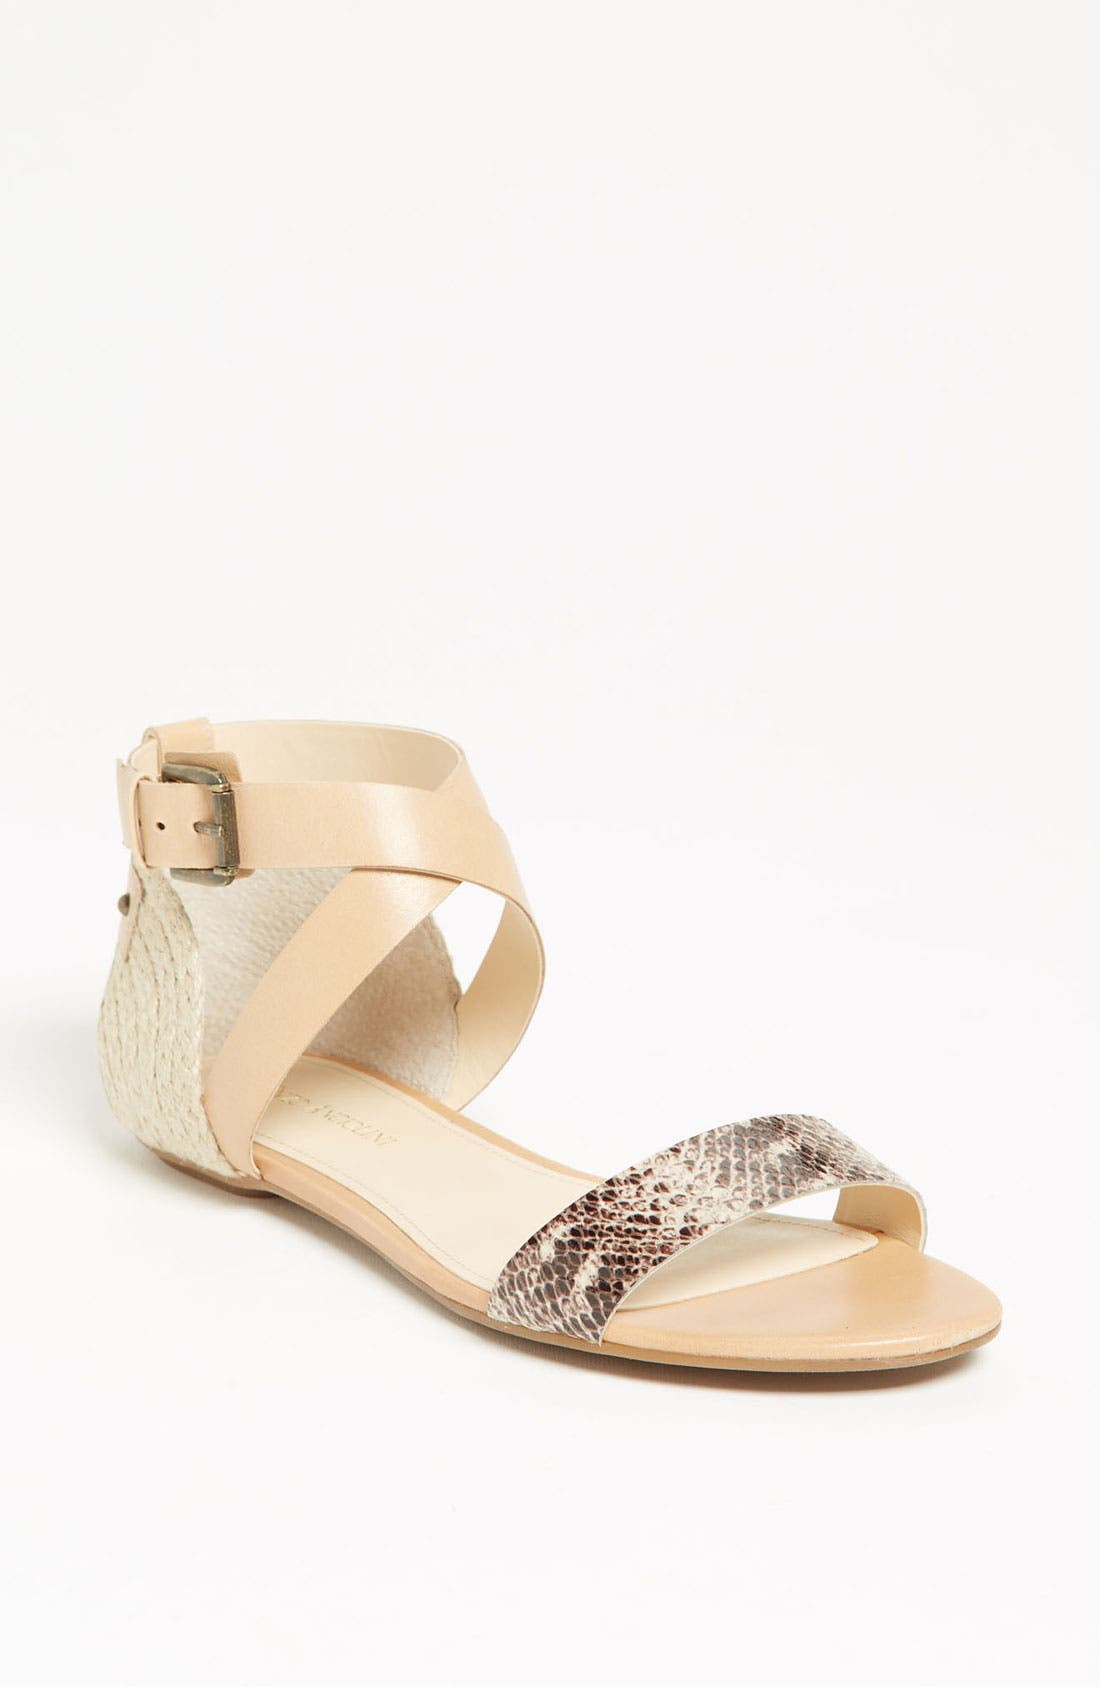 Main Image - Enzo Angiolini 'Katira' Sandal (Special Purchase)